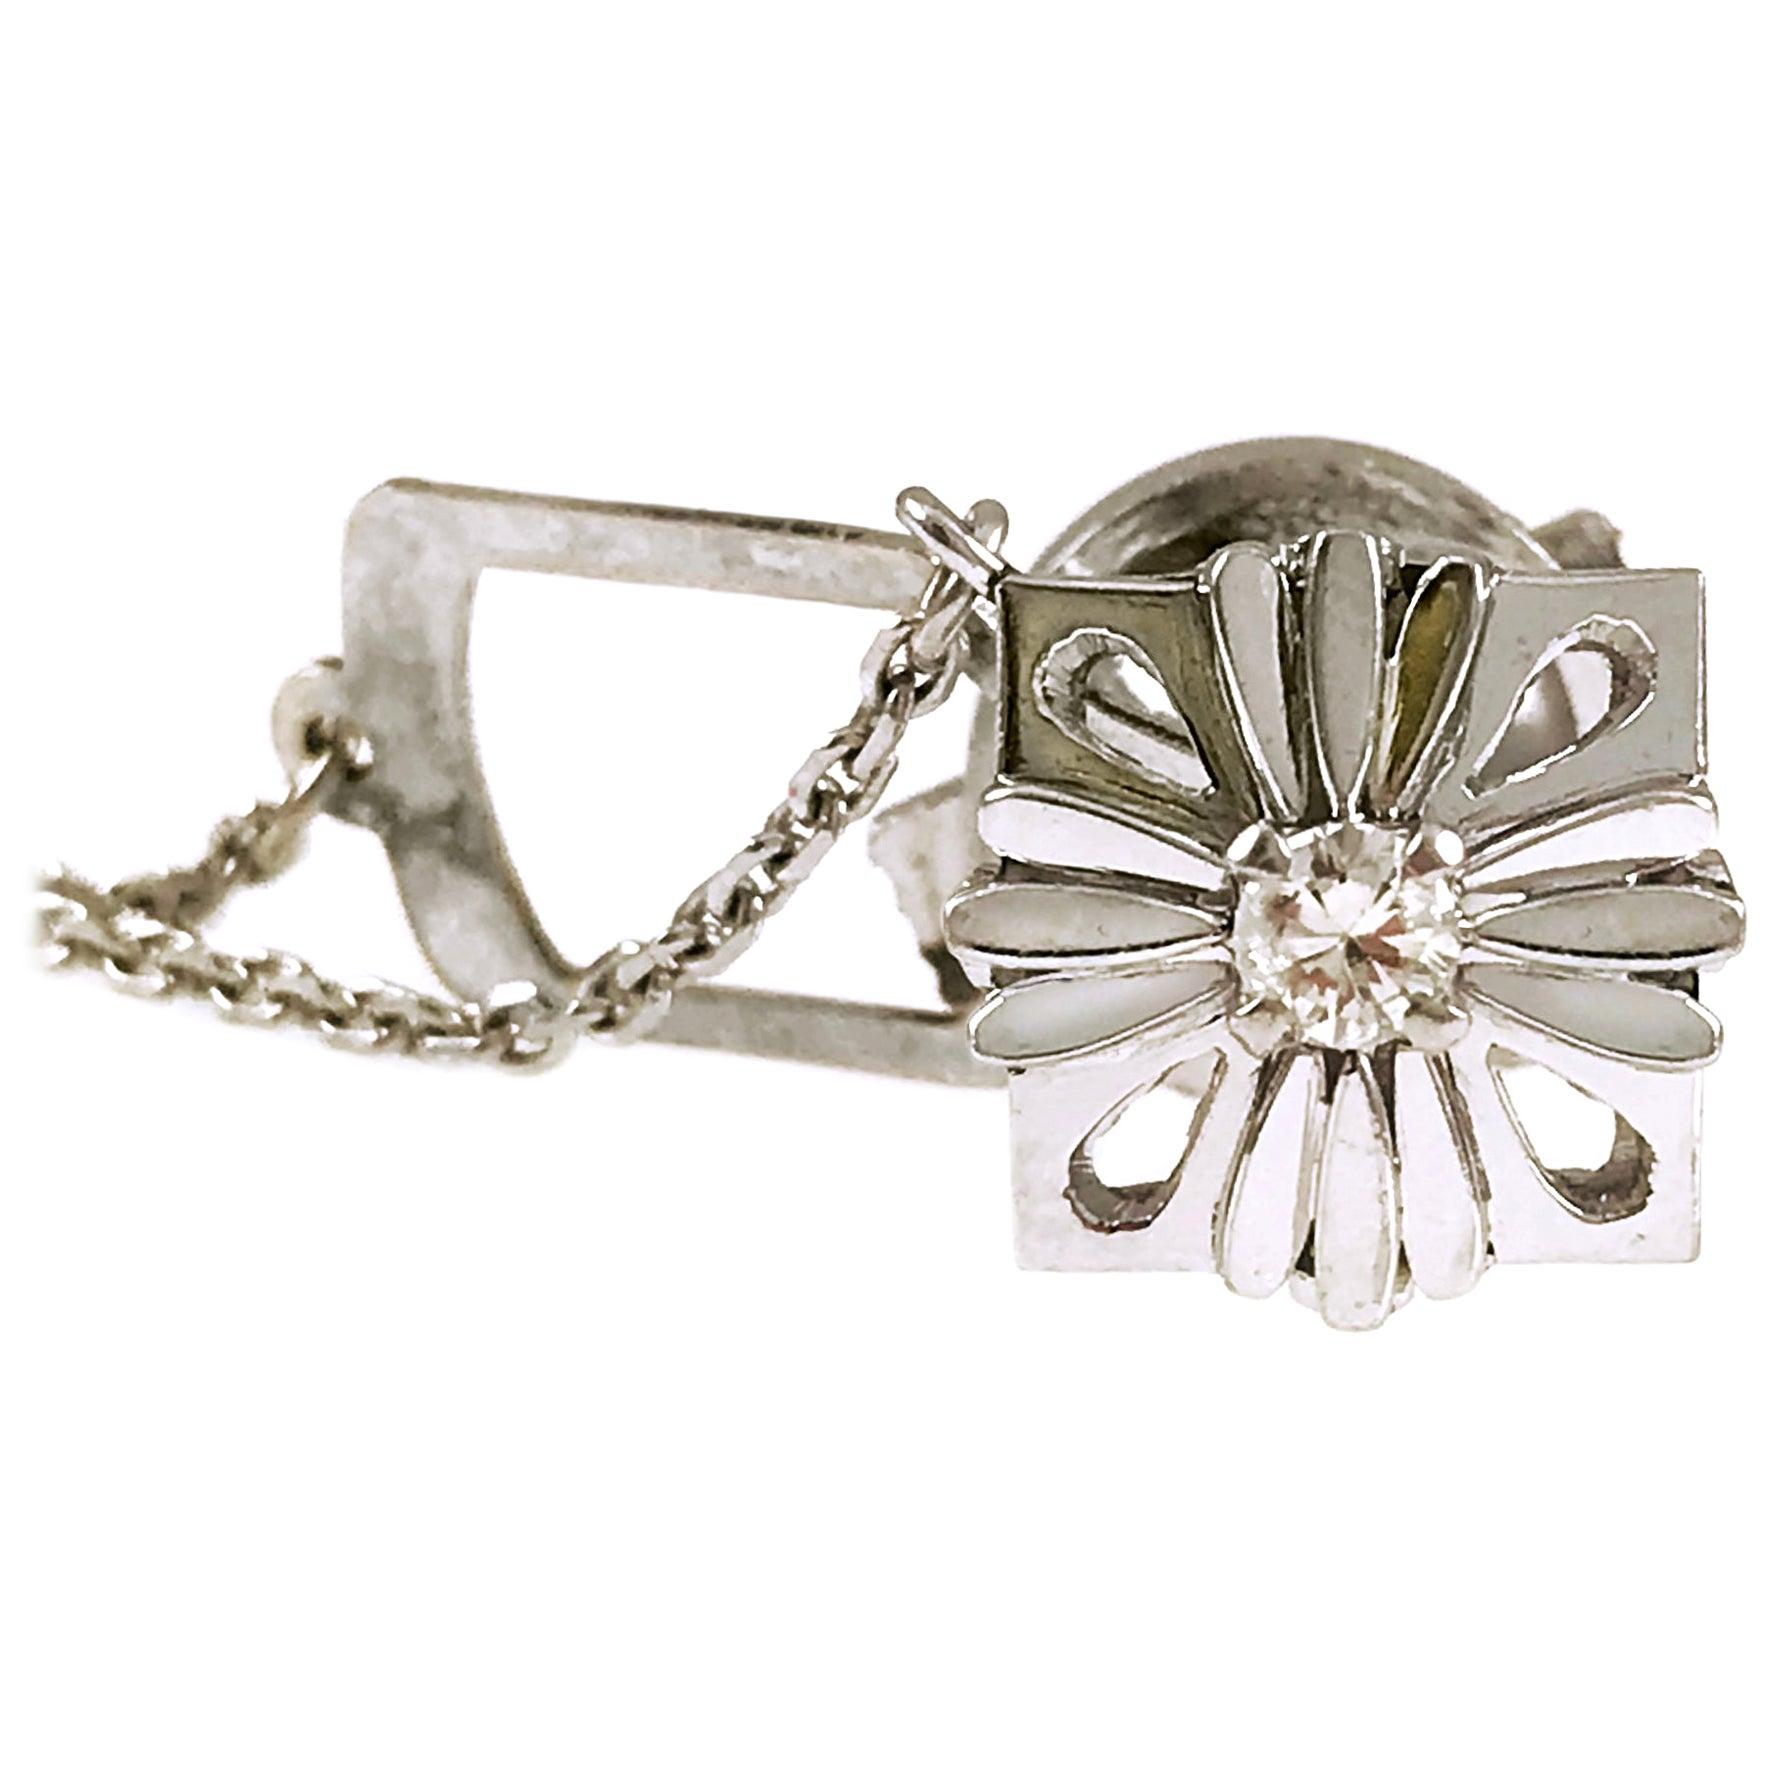 Platinum Diamond Tie Tack, Chain